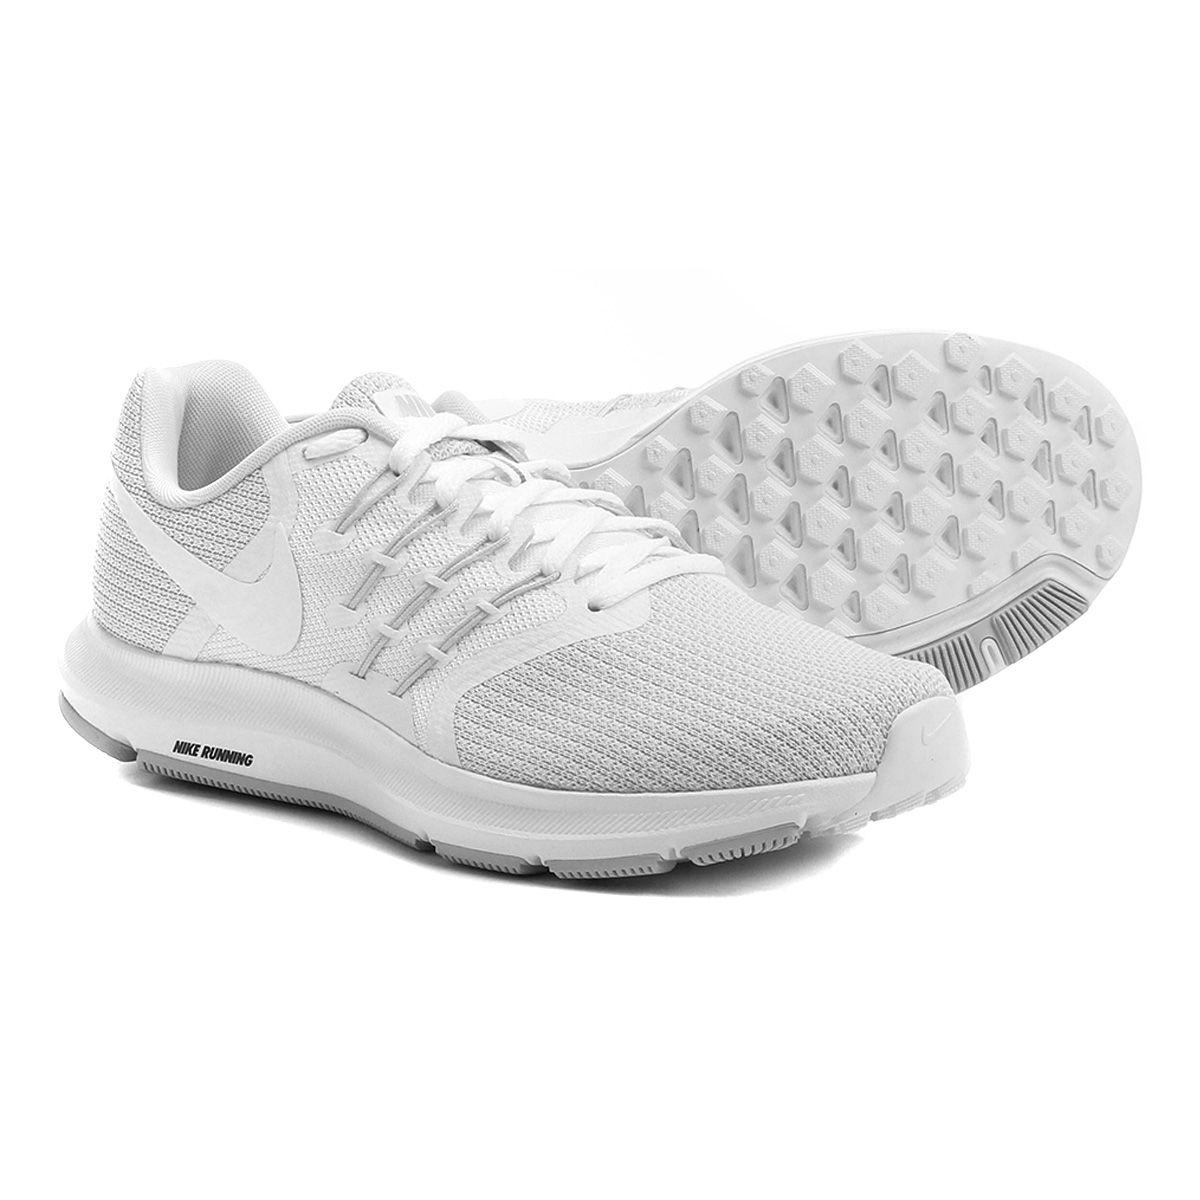 Tênis Nike Run Swift Feminino Preto e Branco  c039ae77960c1